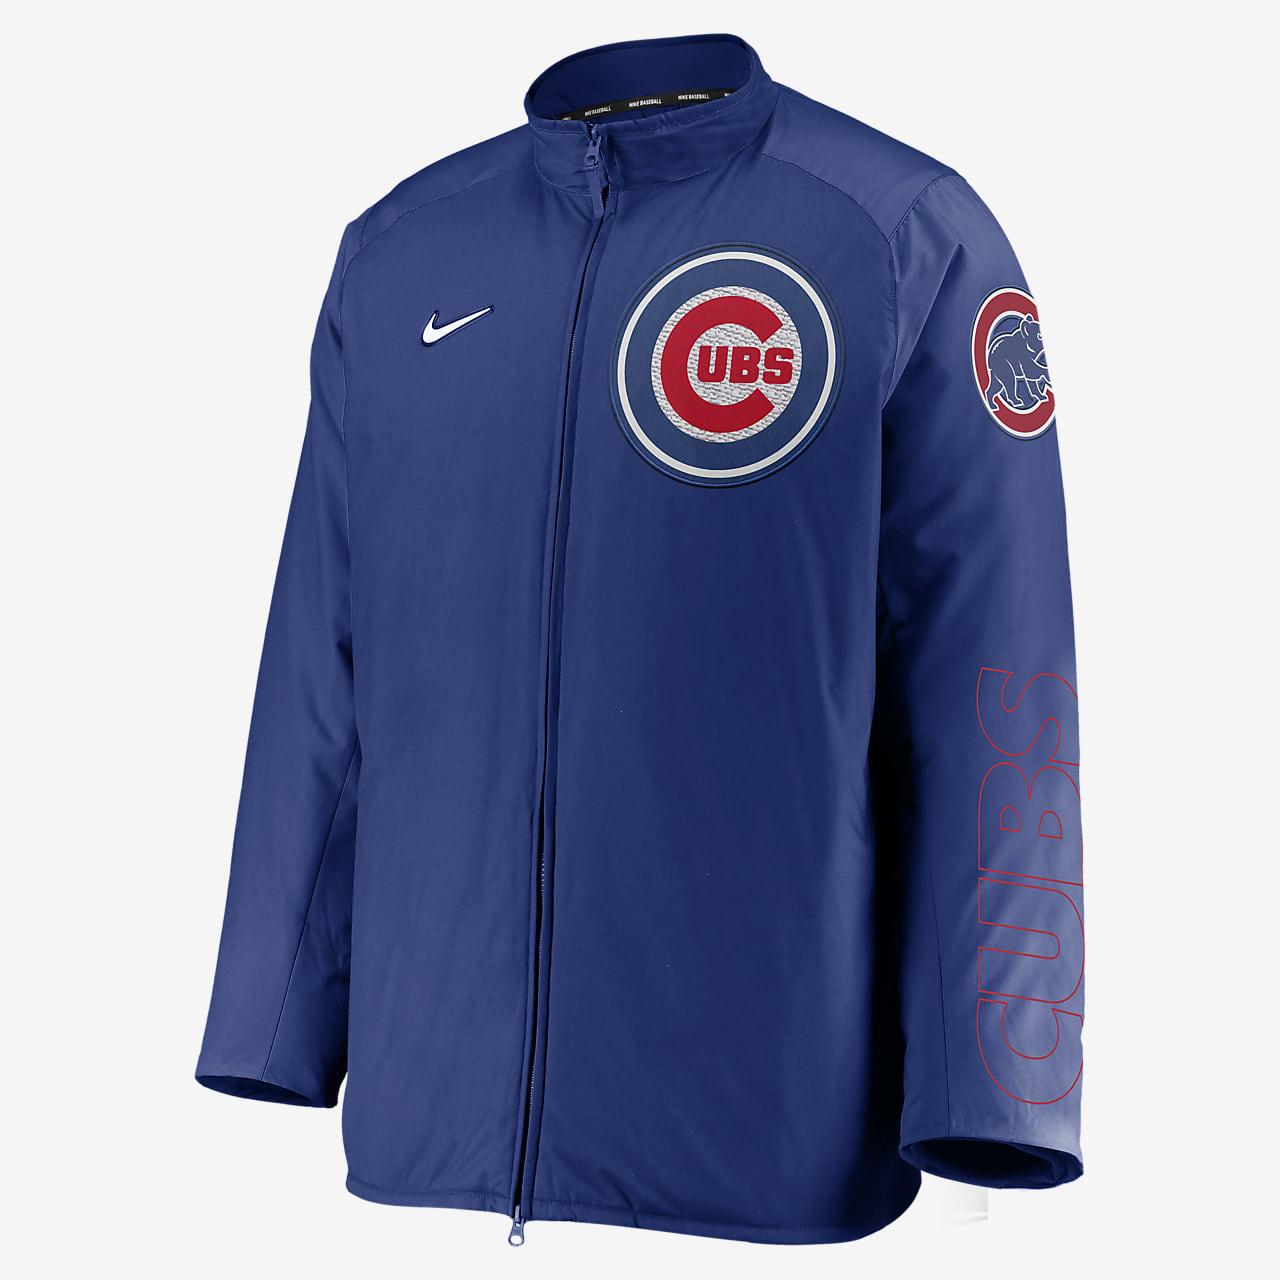 Nike Dugout (MLB Chicago Cubs) Men's Full-Zip Jacket